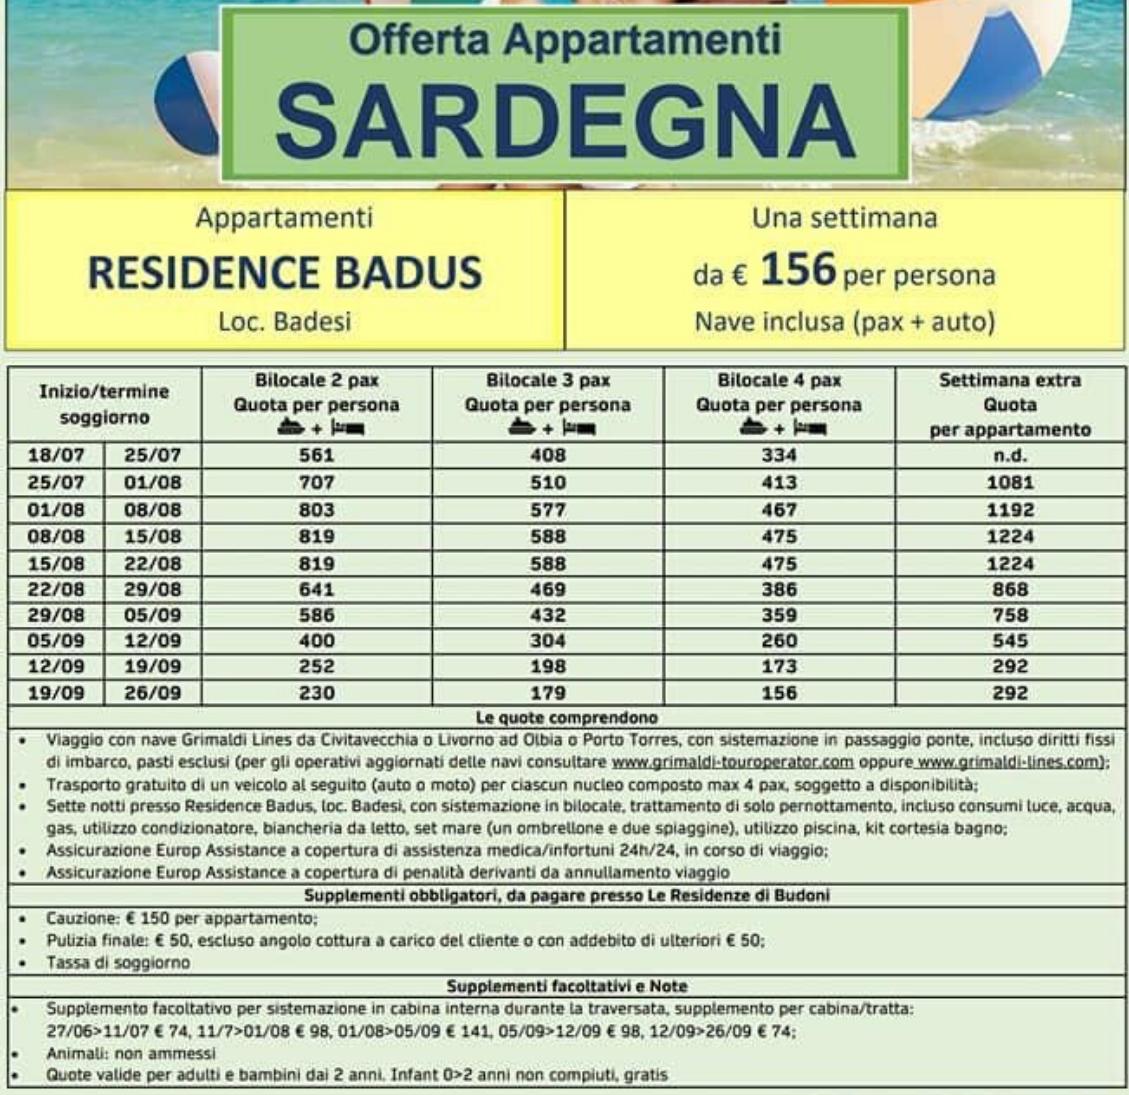 Offerta Appartamenti in Sardegna Resicence Badus